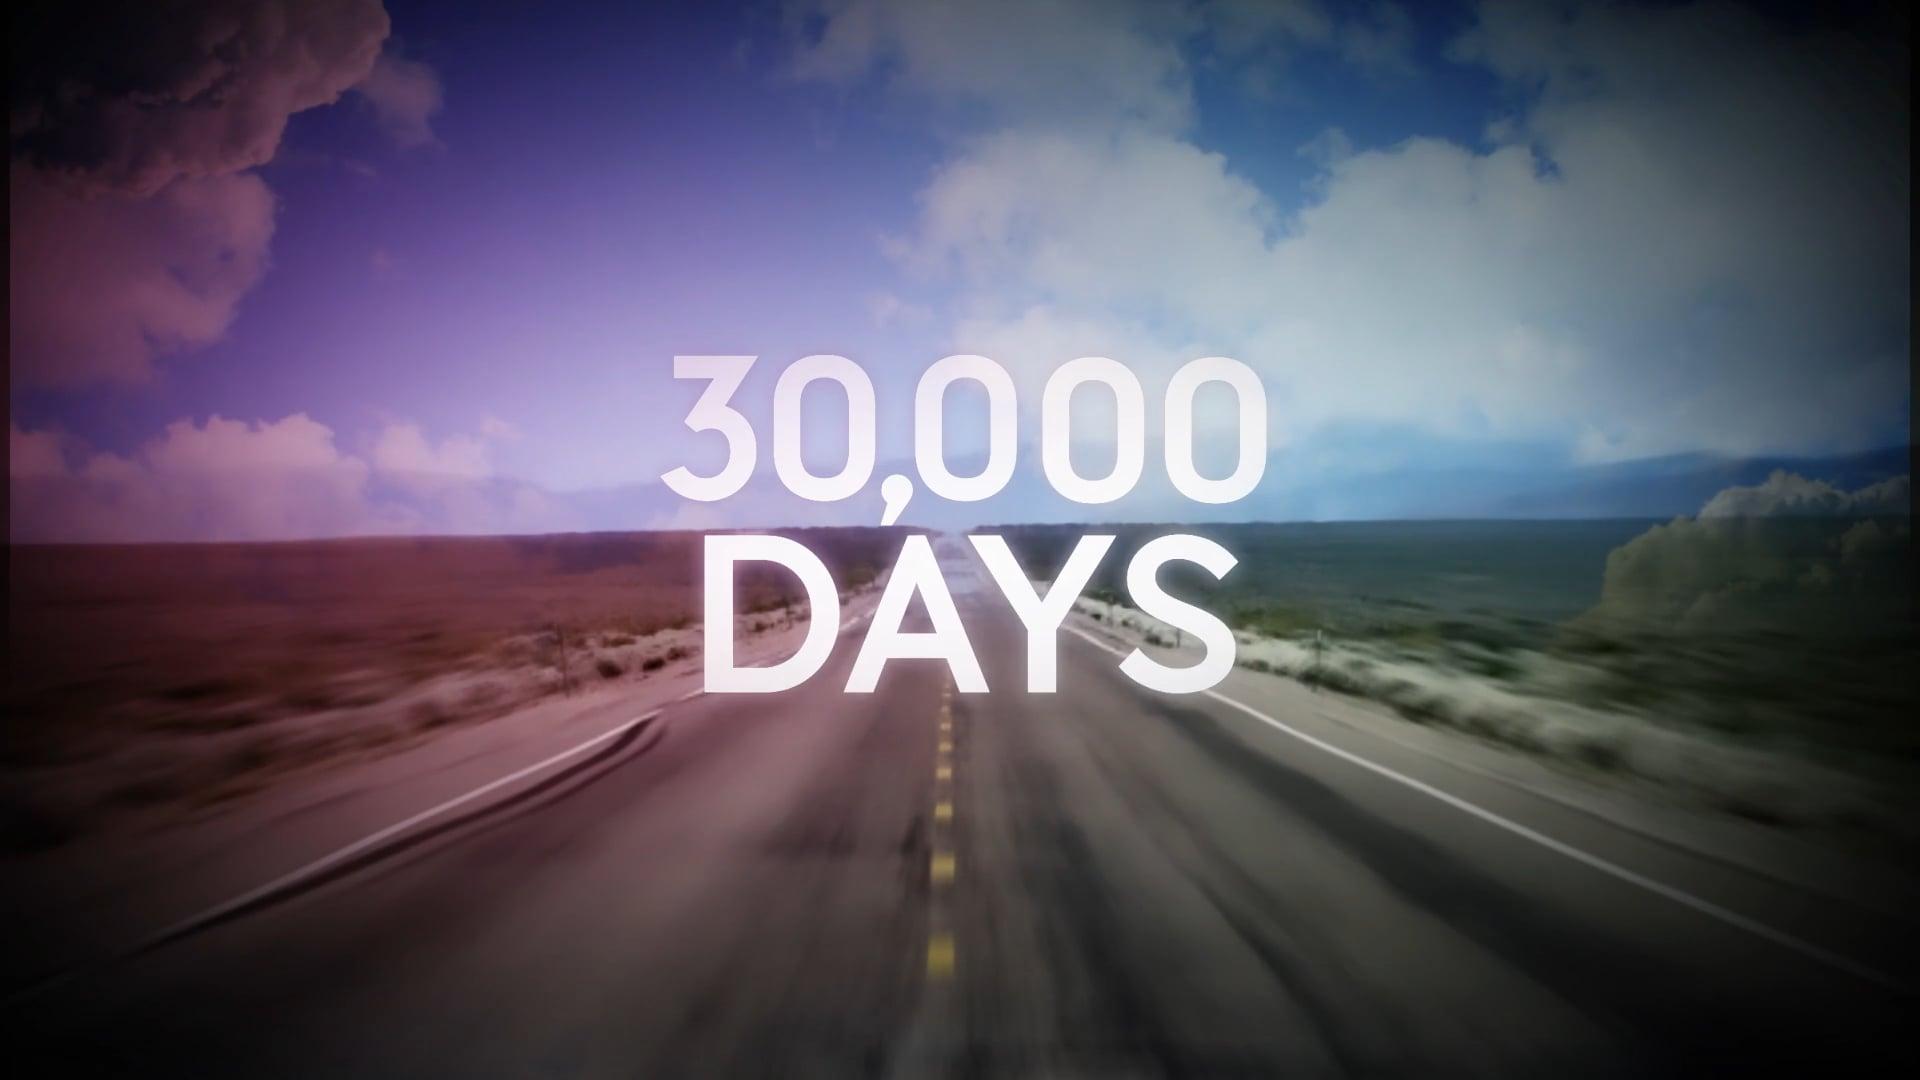 30000 Days - 11 min Film